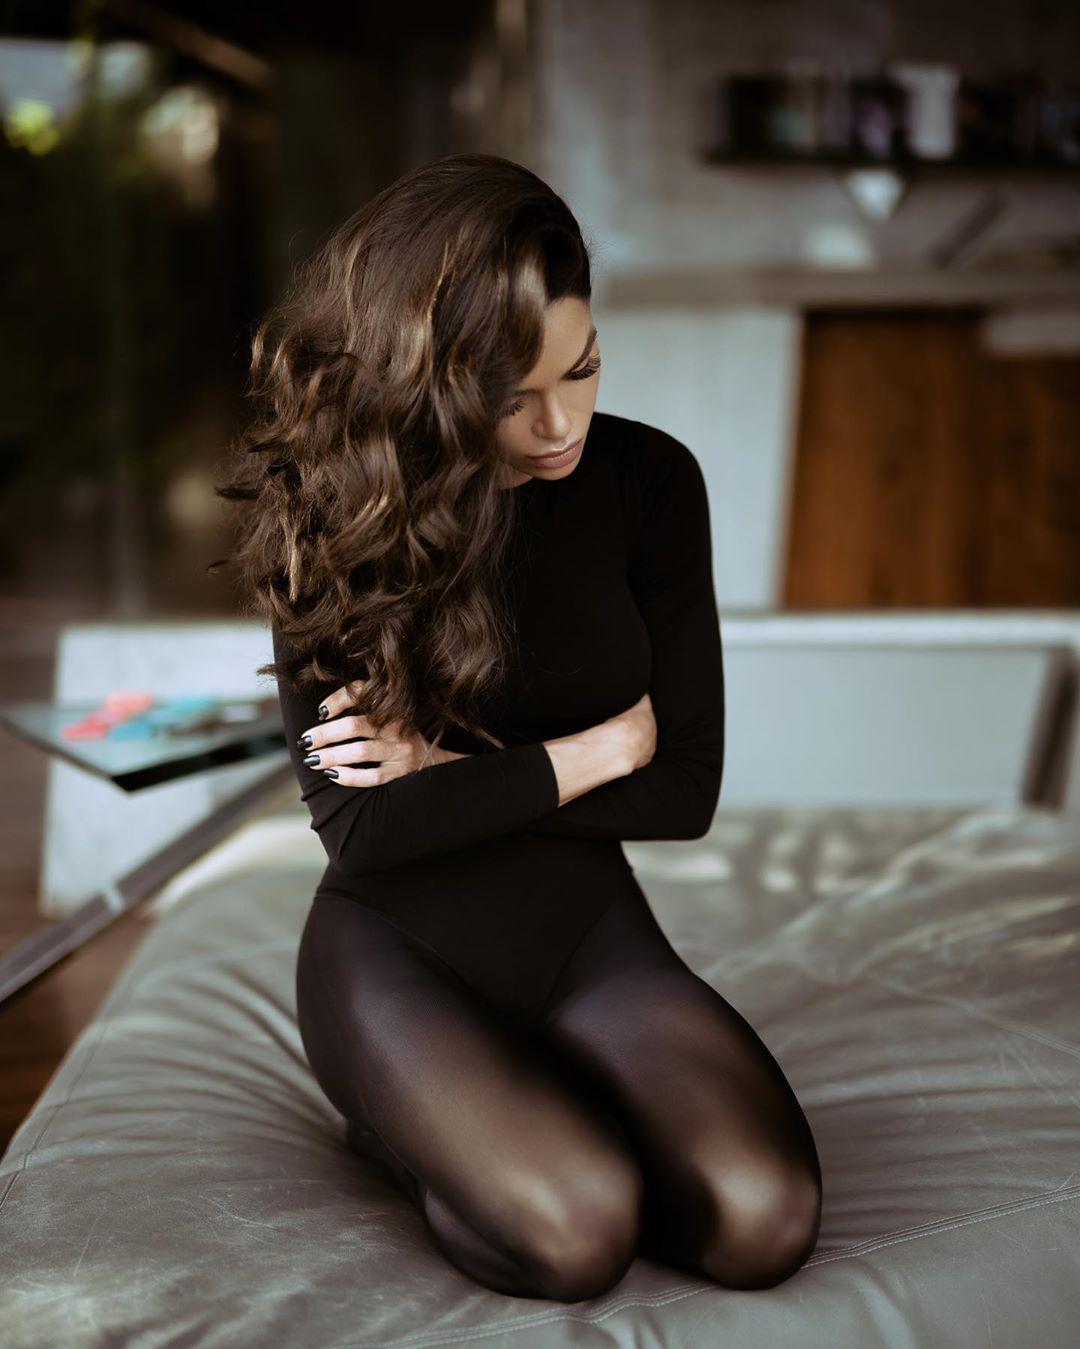 Christina-Dreaming-Wallpapers-7